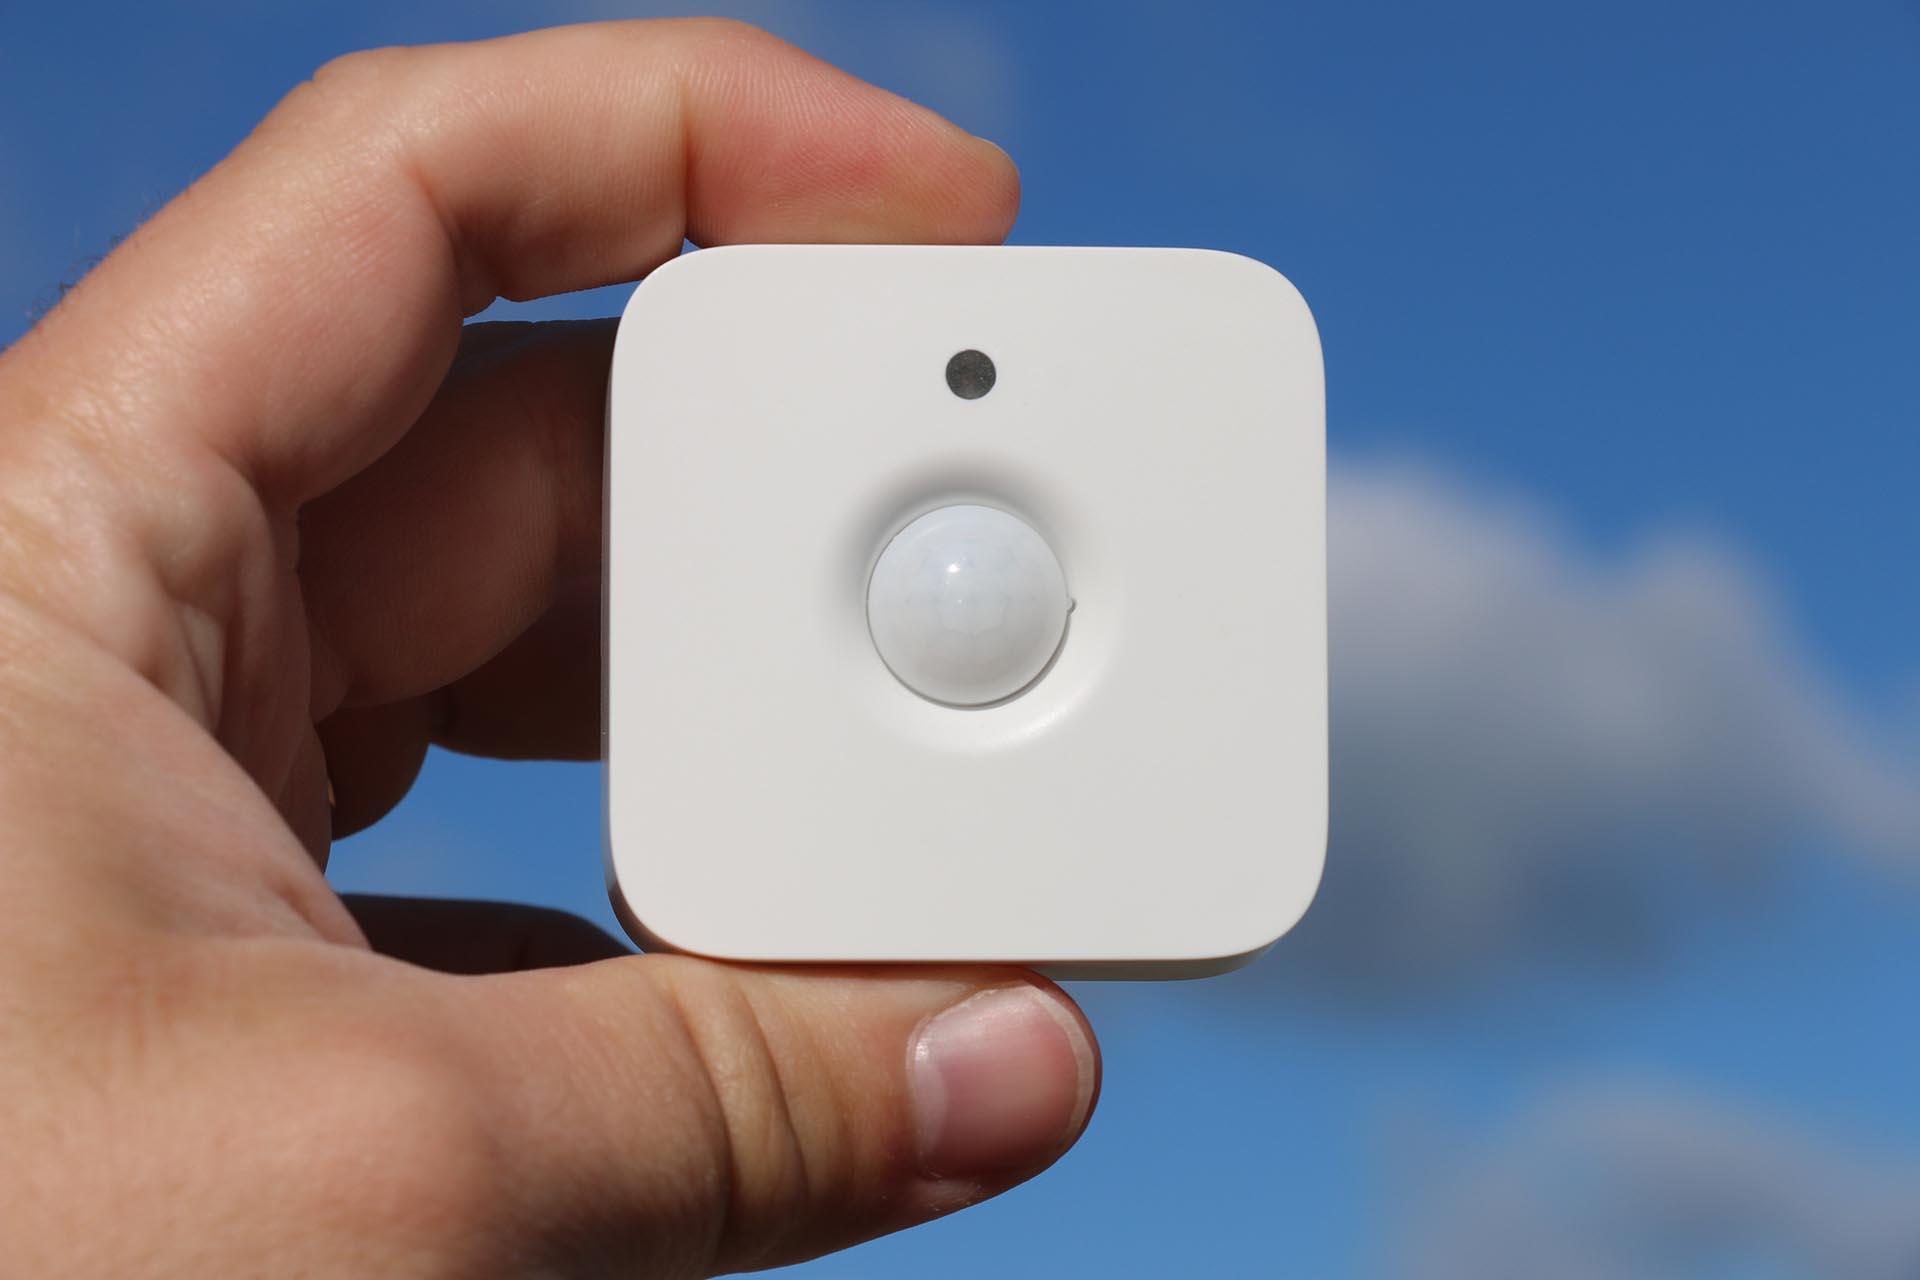 Slaapkamer Lamp Philips : Review philips hue motion sensor gadgetgear